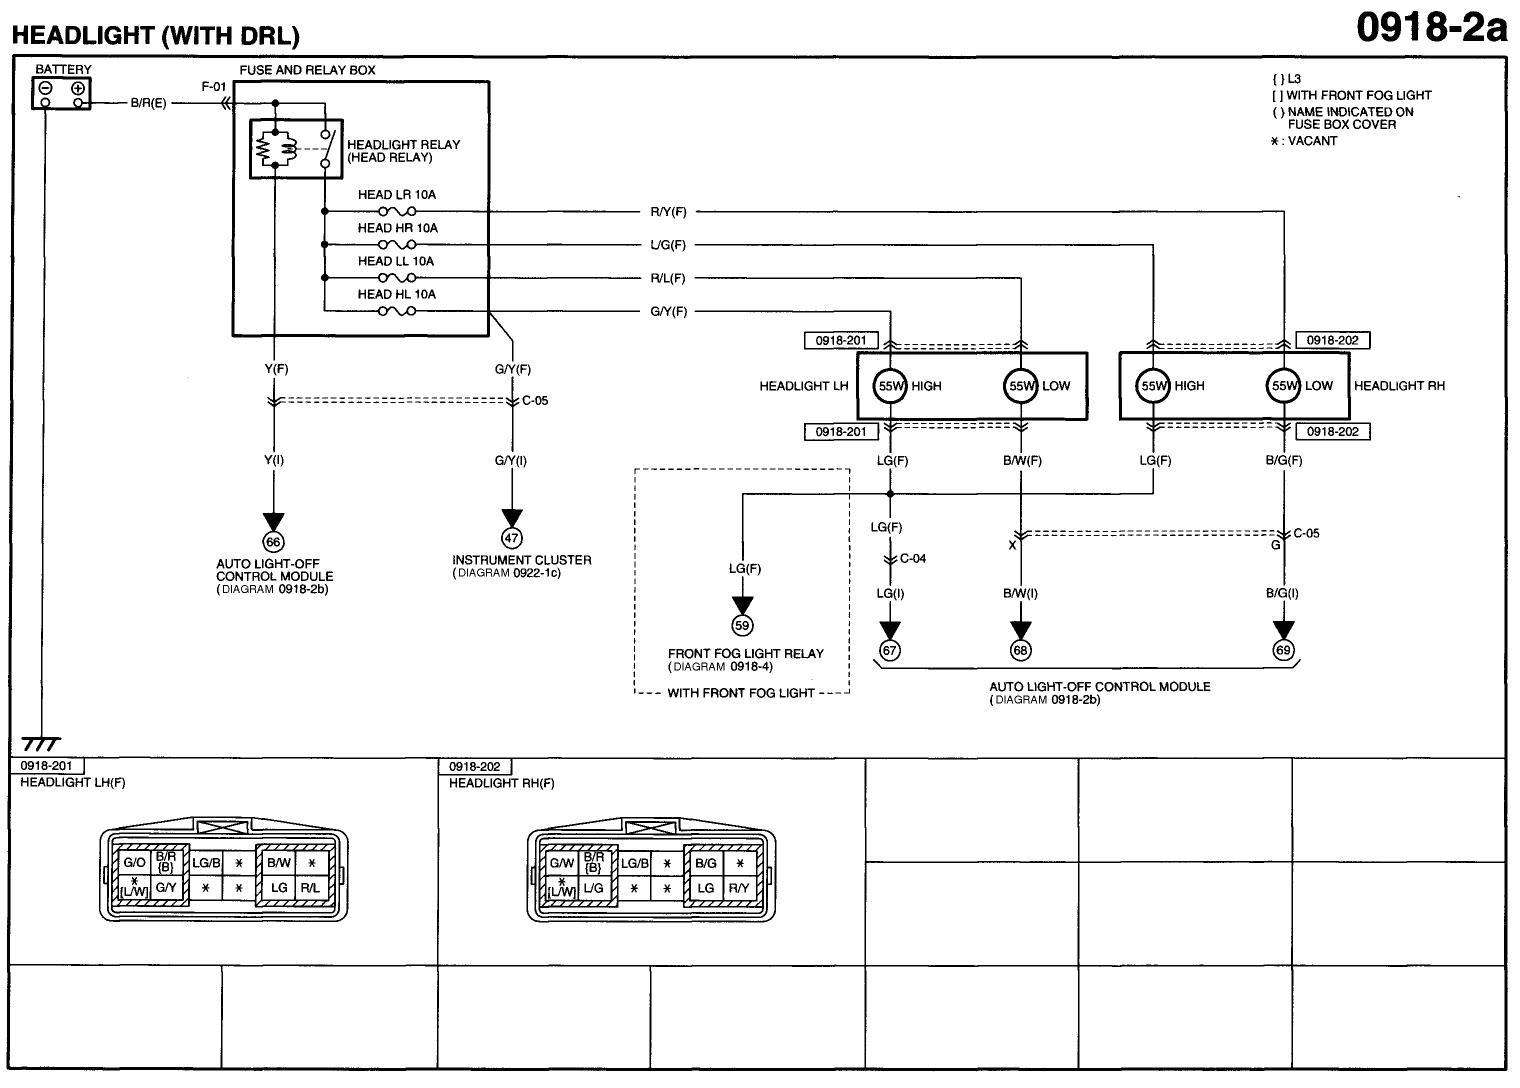 headlight diagram for 2000 mazda 626 wiring diagram review mazda 626 ge wiring diagram